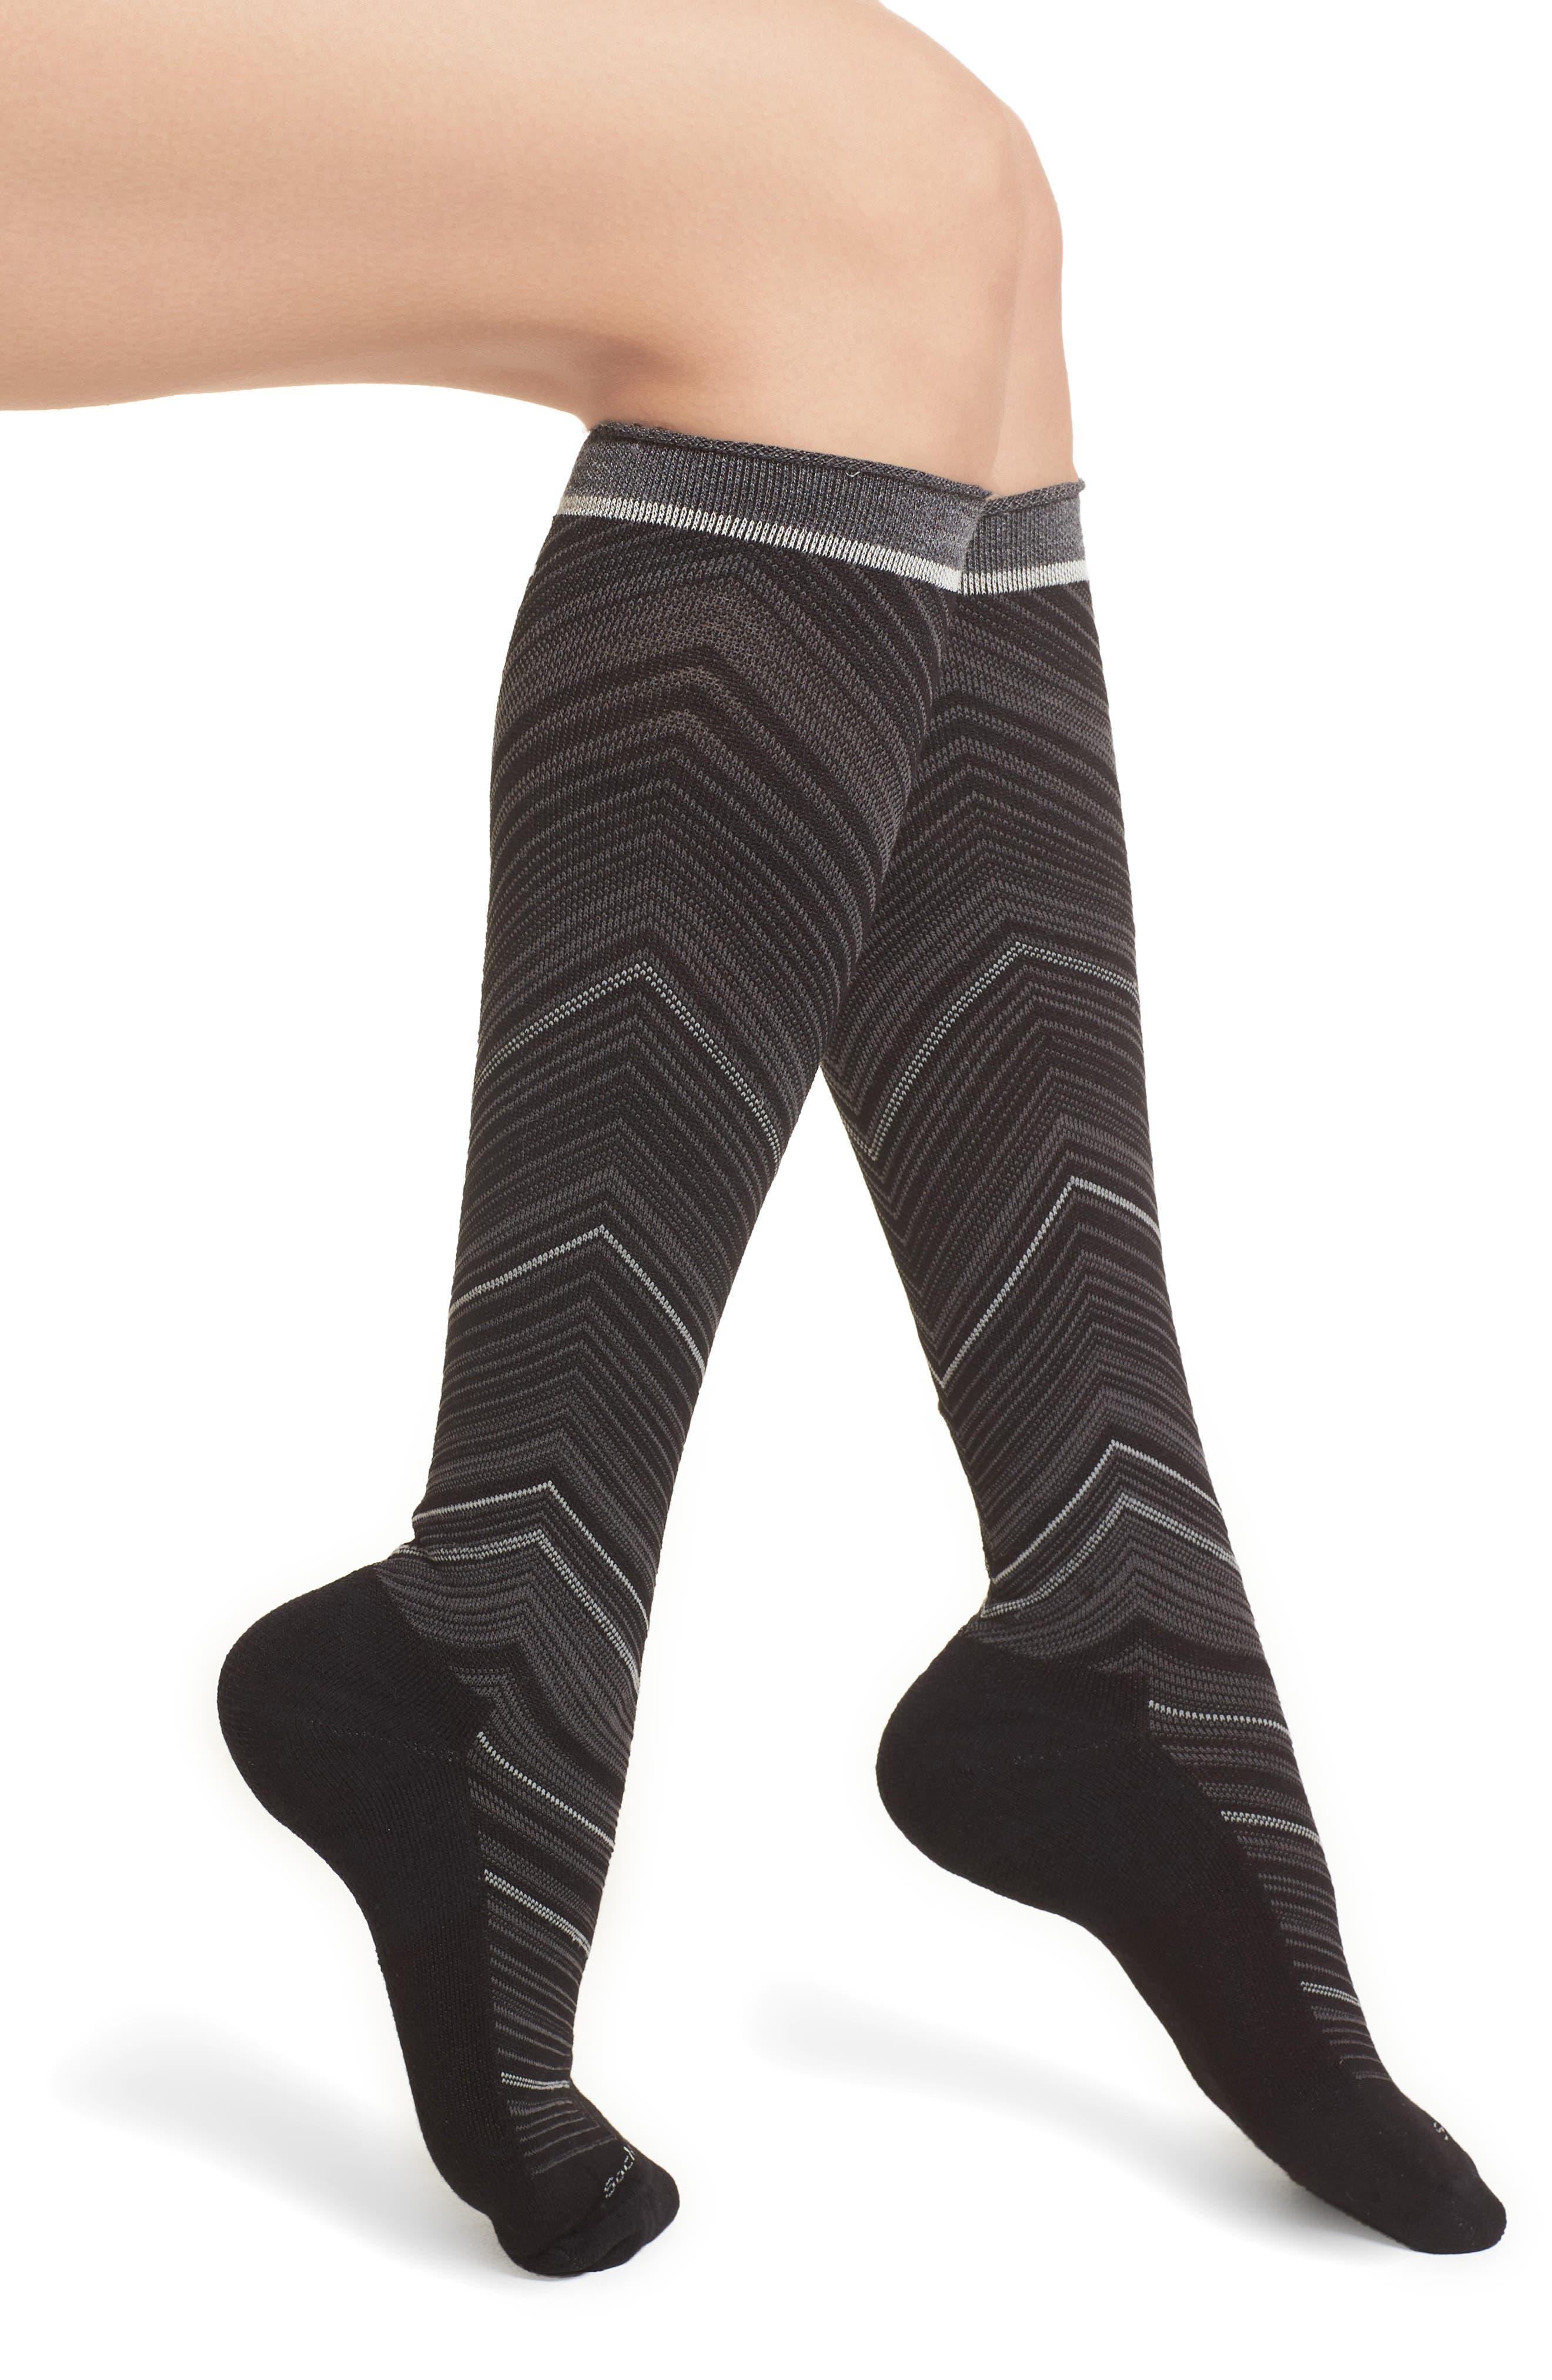 Full Calf Flattery Compression Socks,                             Main thumbnail 1, color,